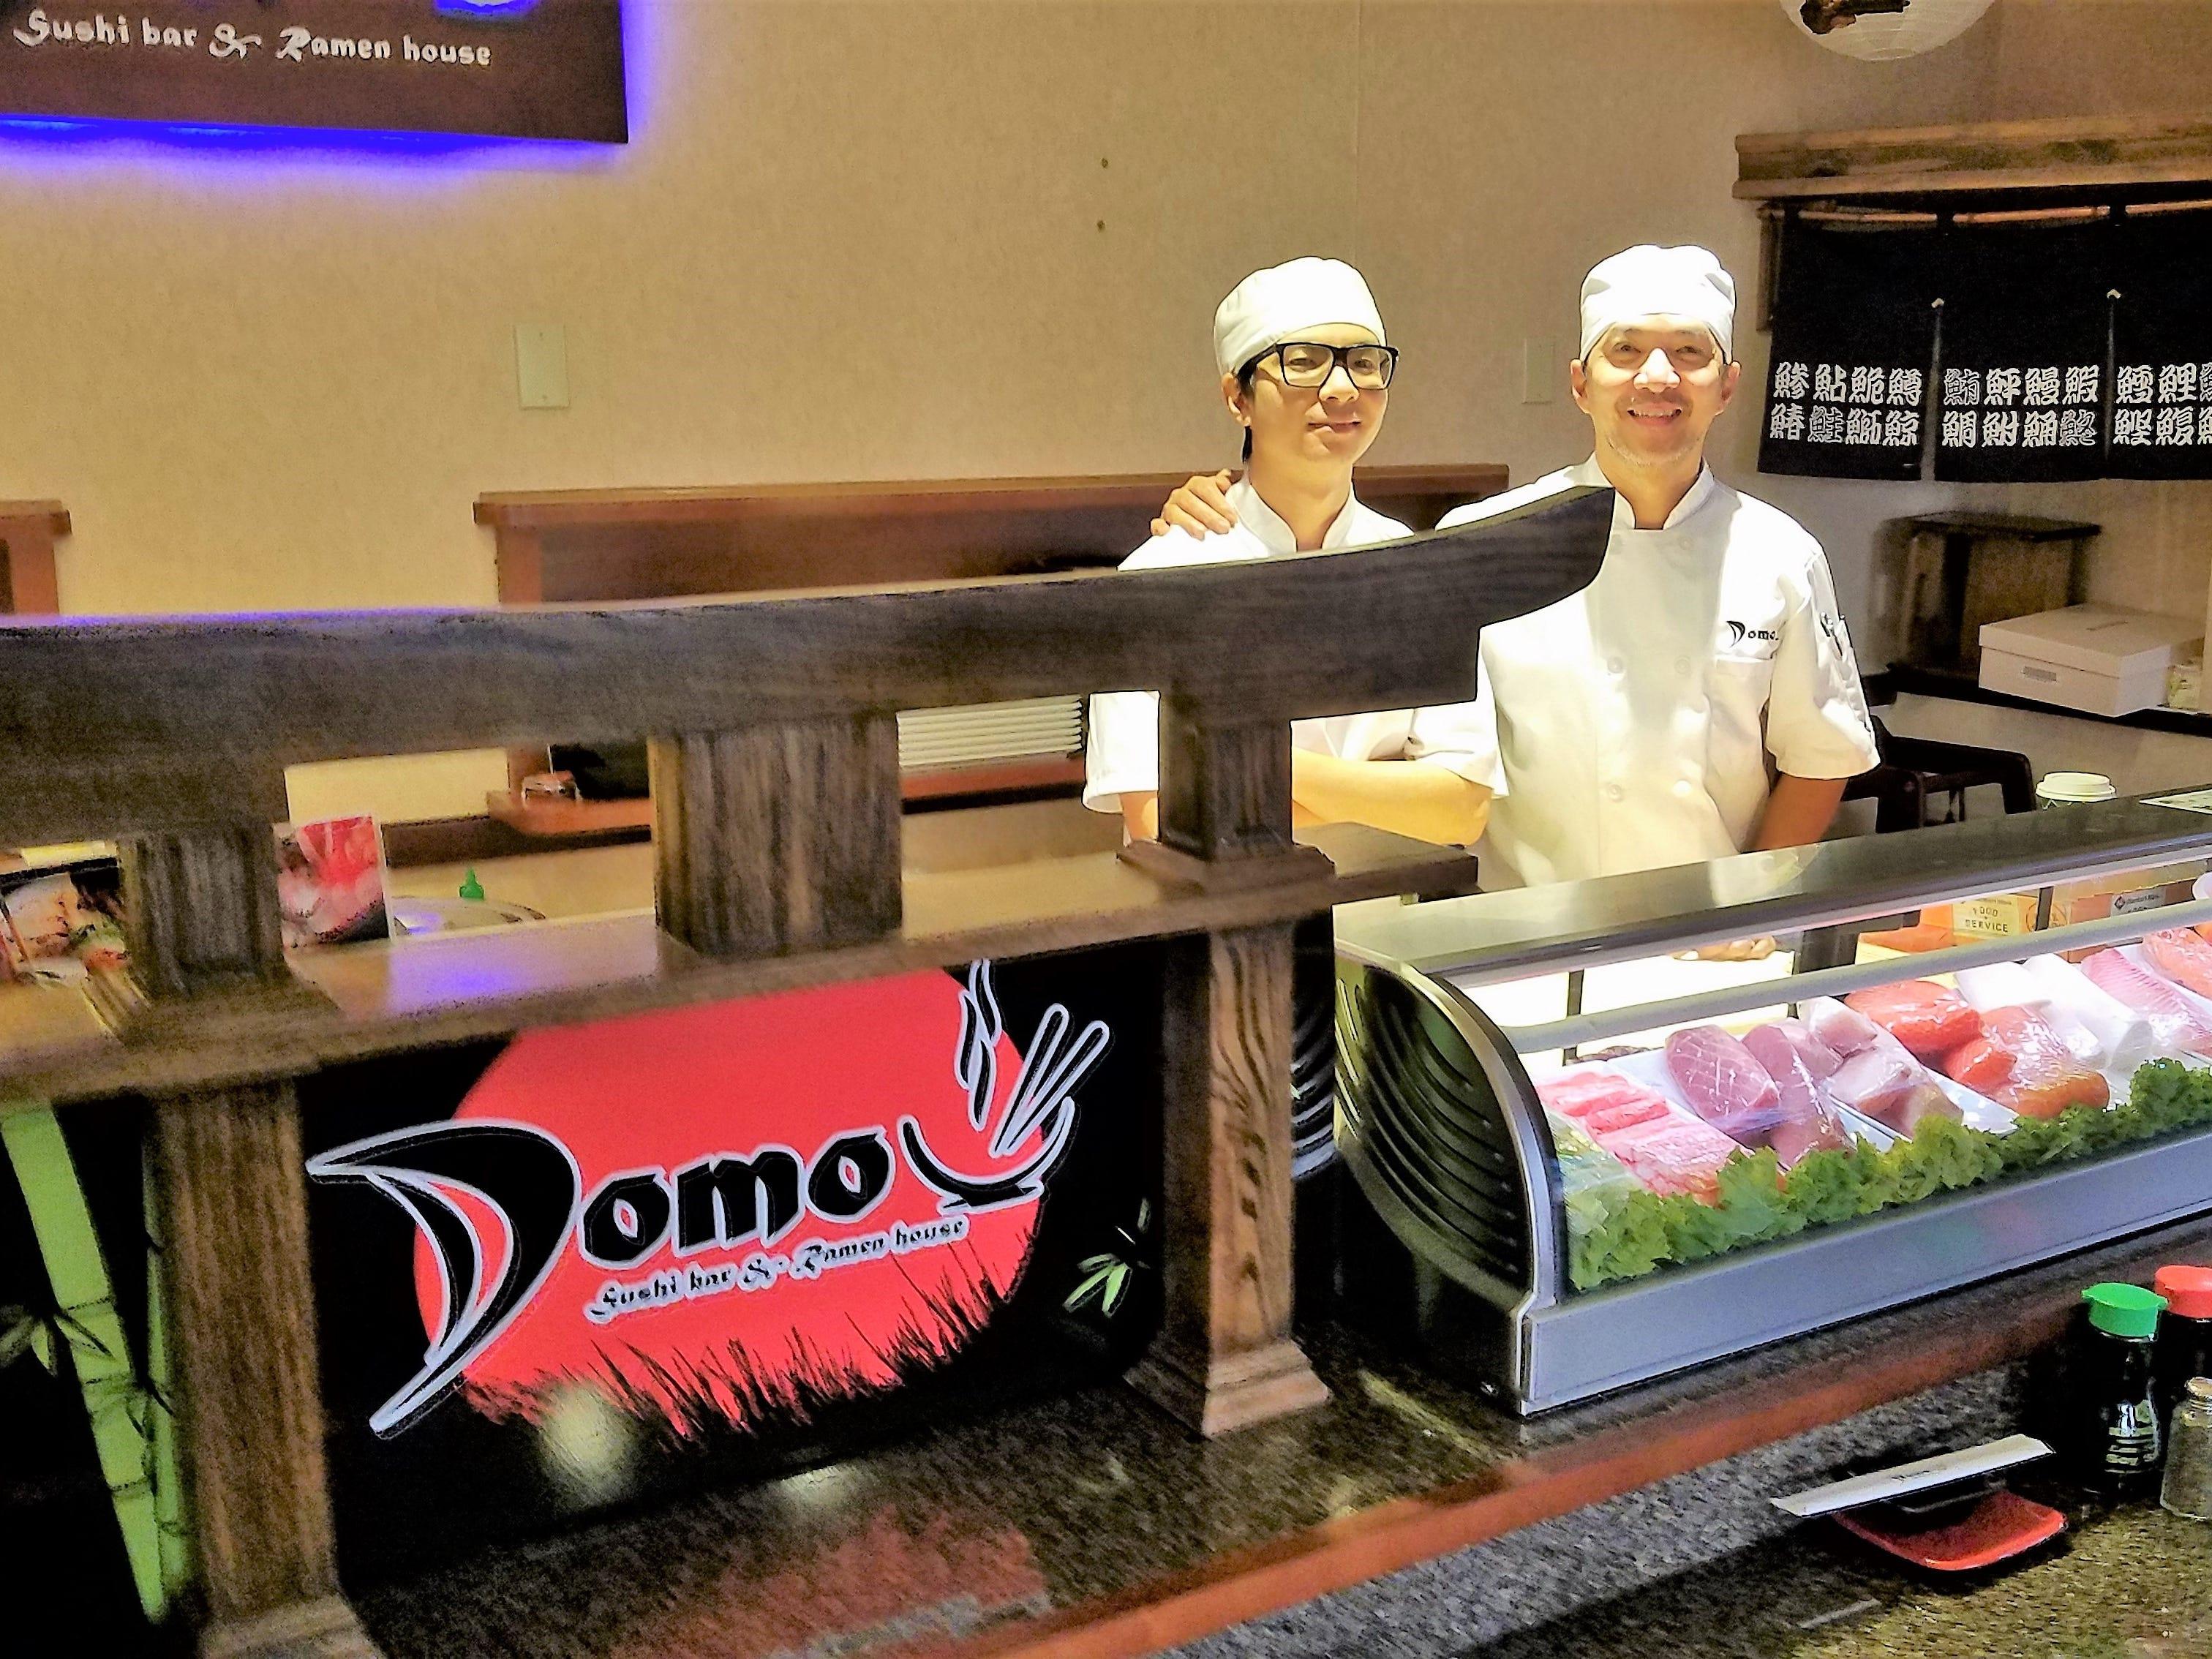 Domo executive chef Marvin Abadicio, right, with his son and sous chef Martin Abadicio.